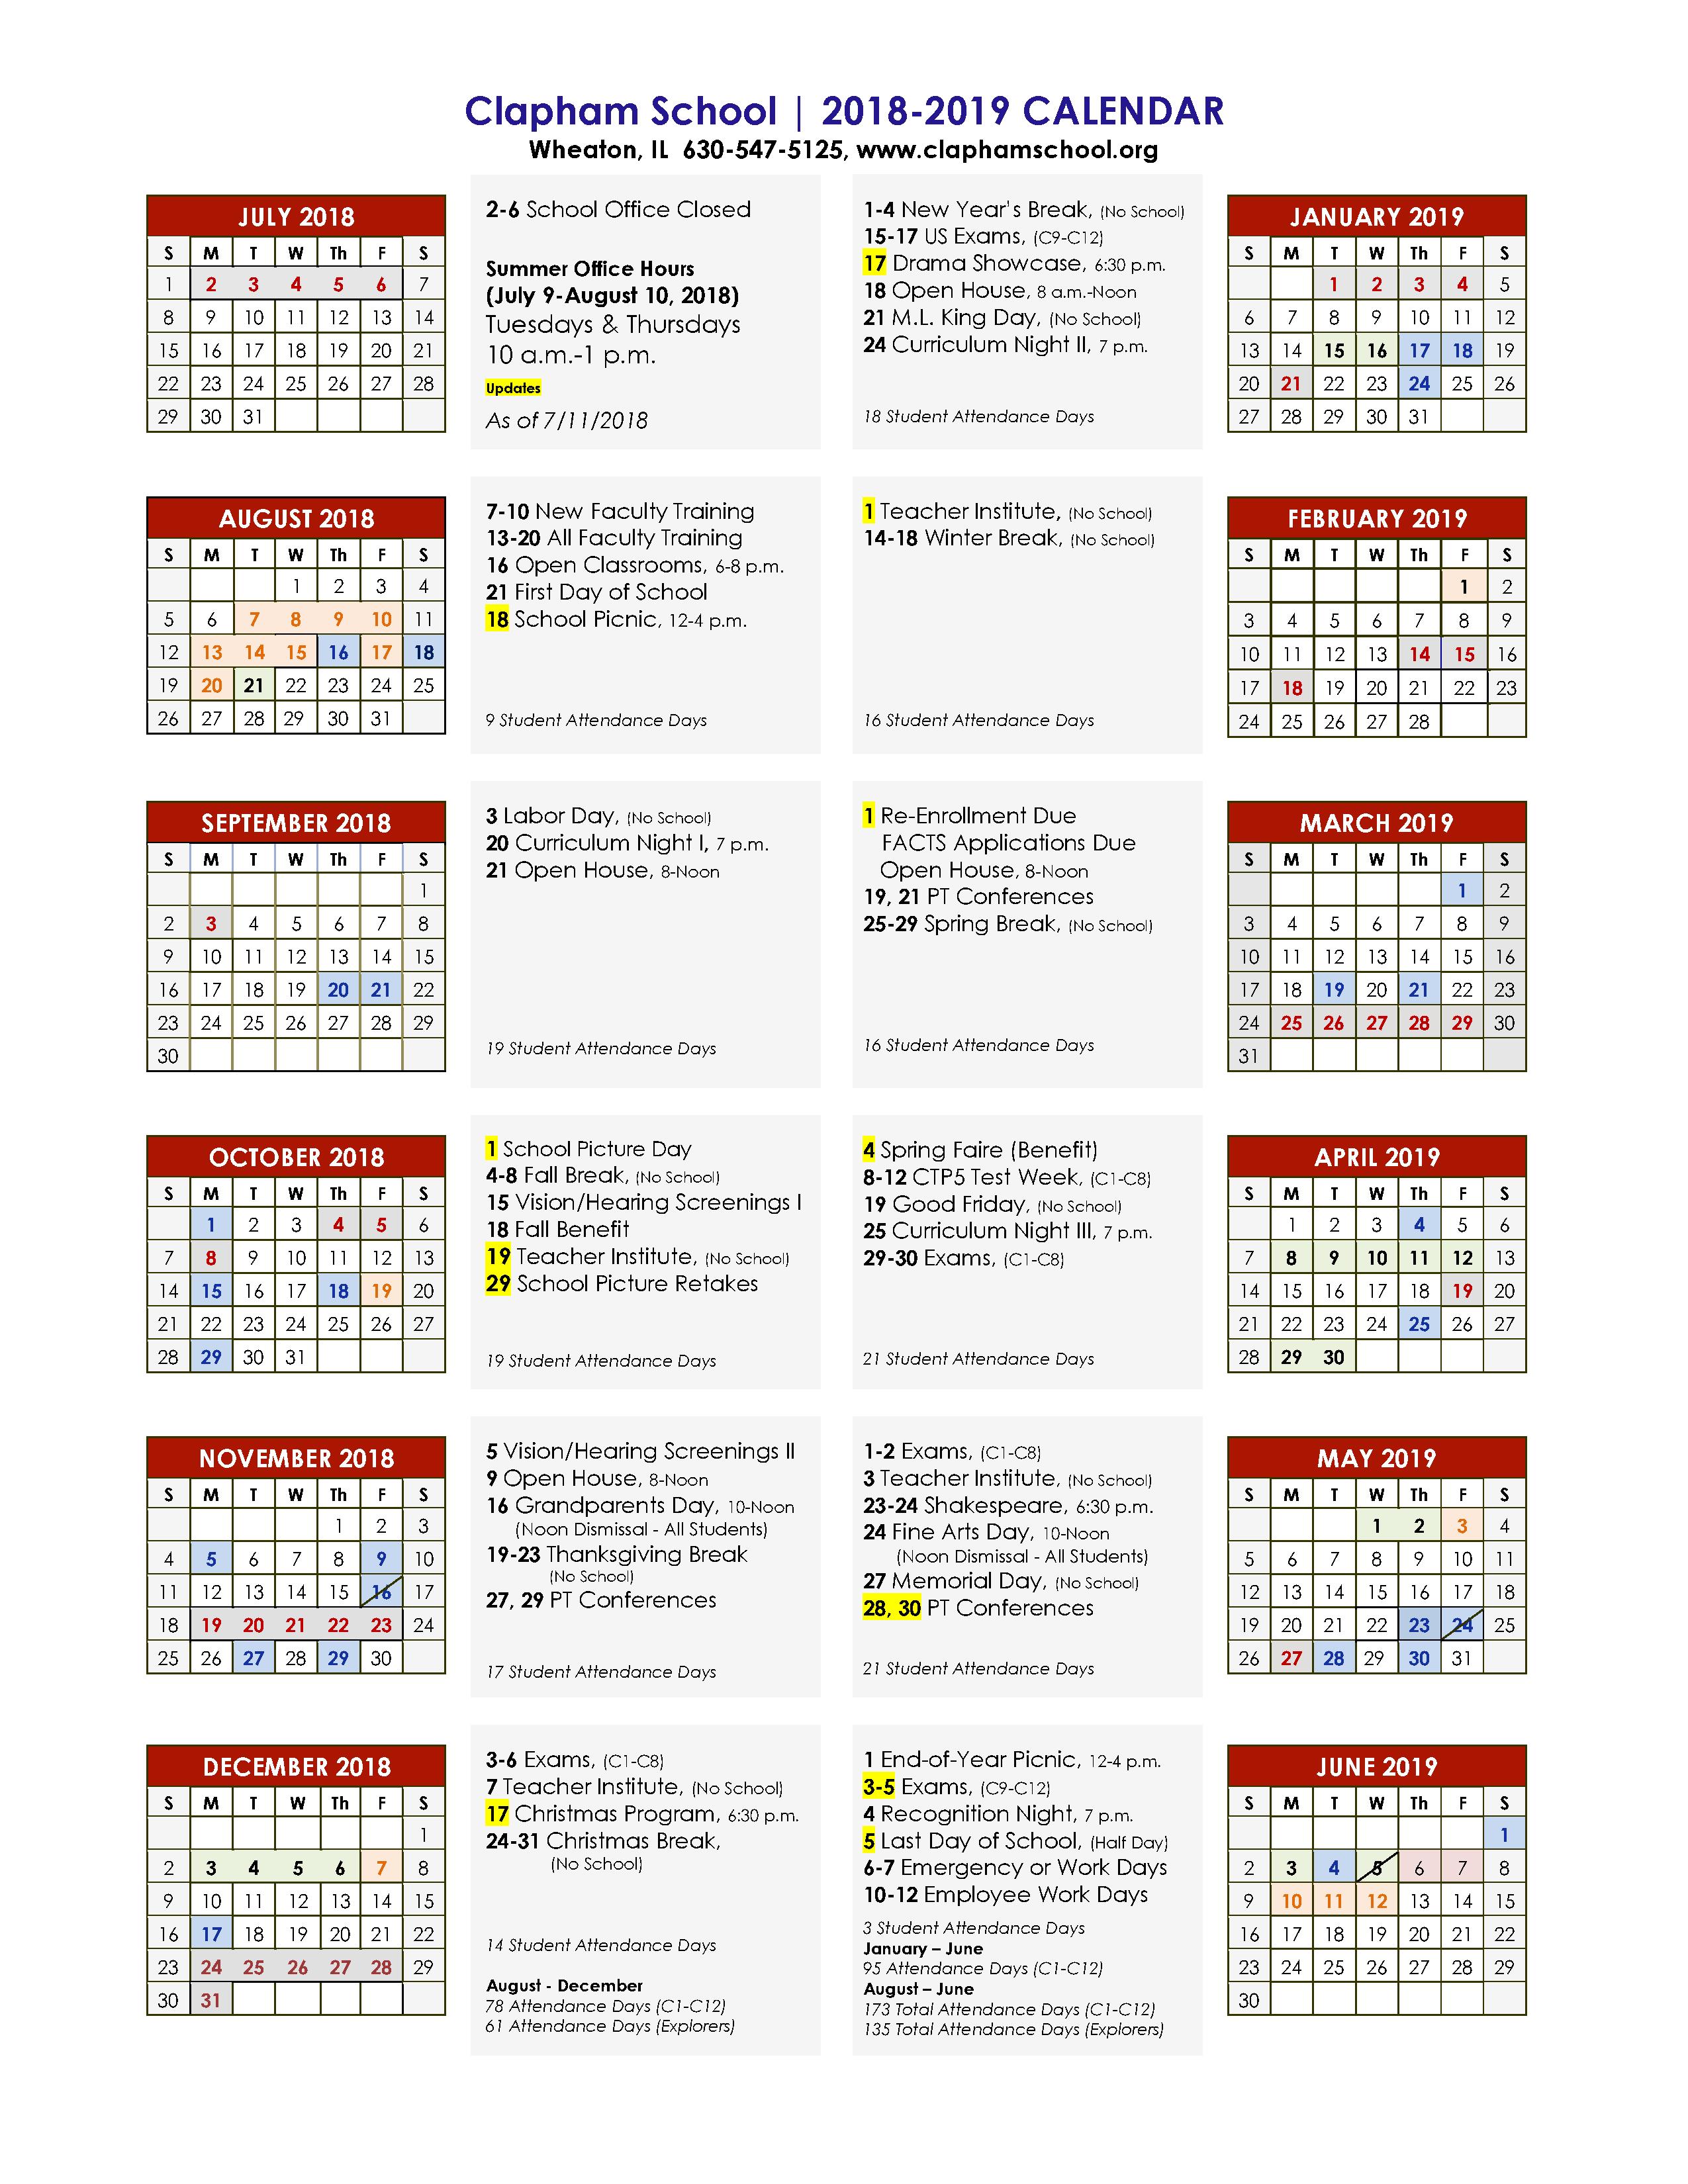 School Calendar 18-19 7-27-18